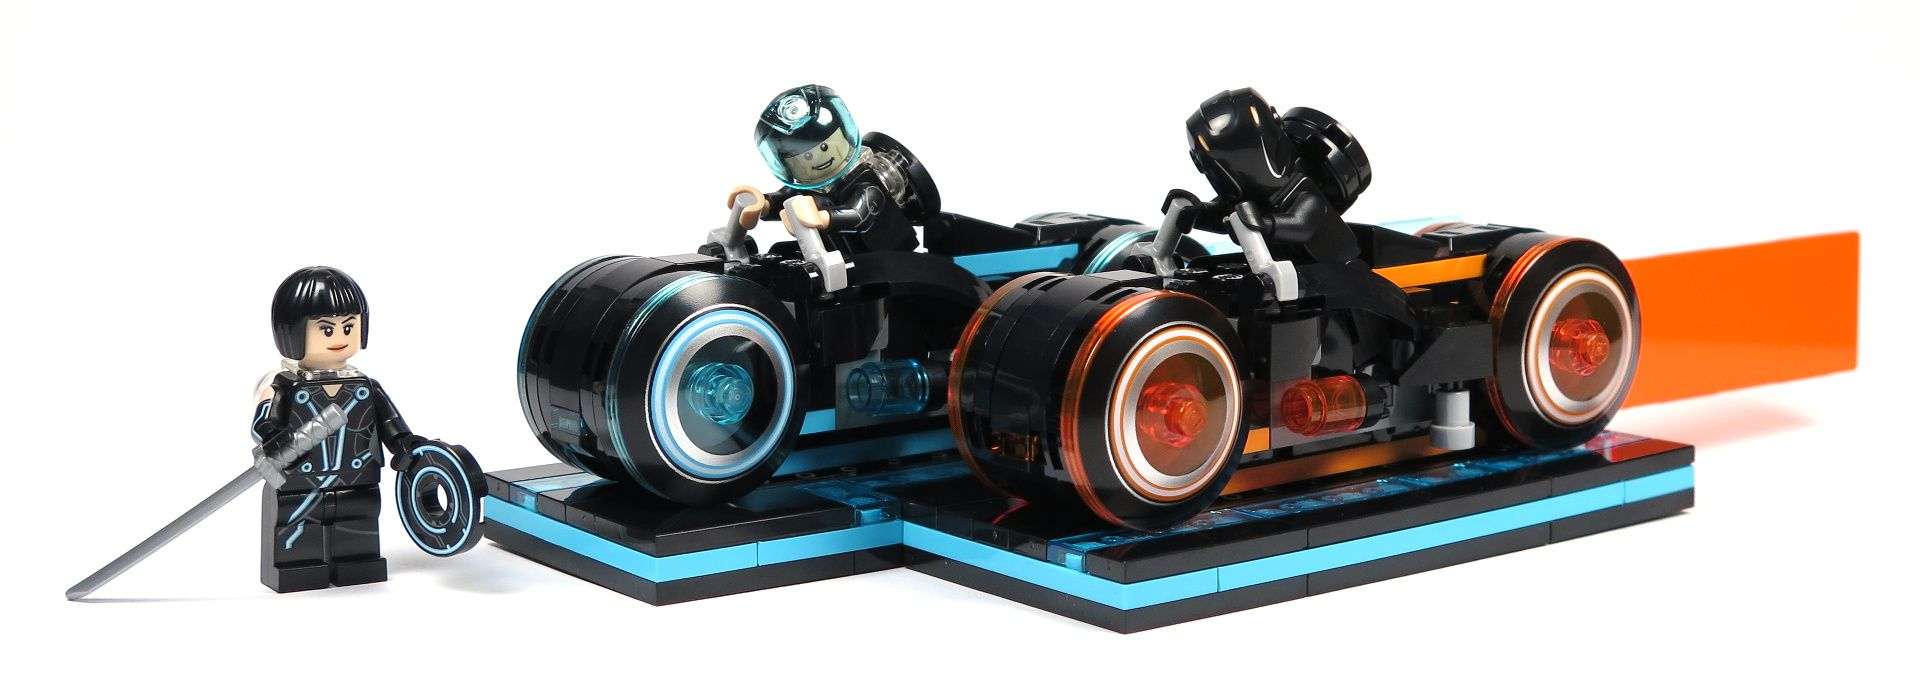 LEGO® Ideas TRON: Legacy (21314) - Set, schmal | ©2018 Brickzeit